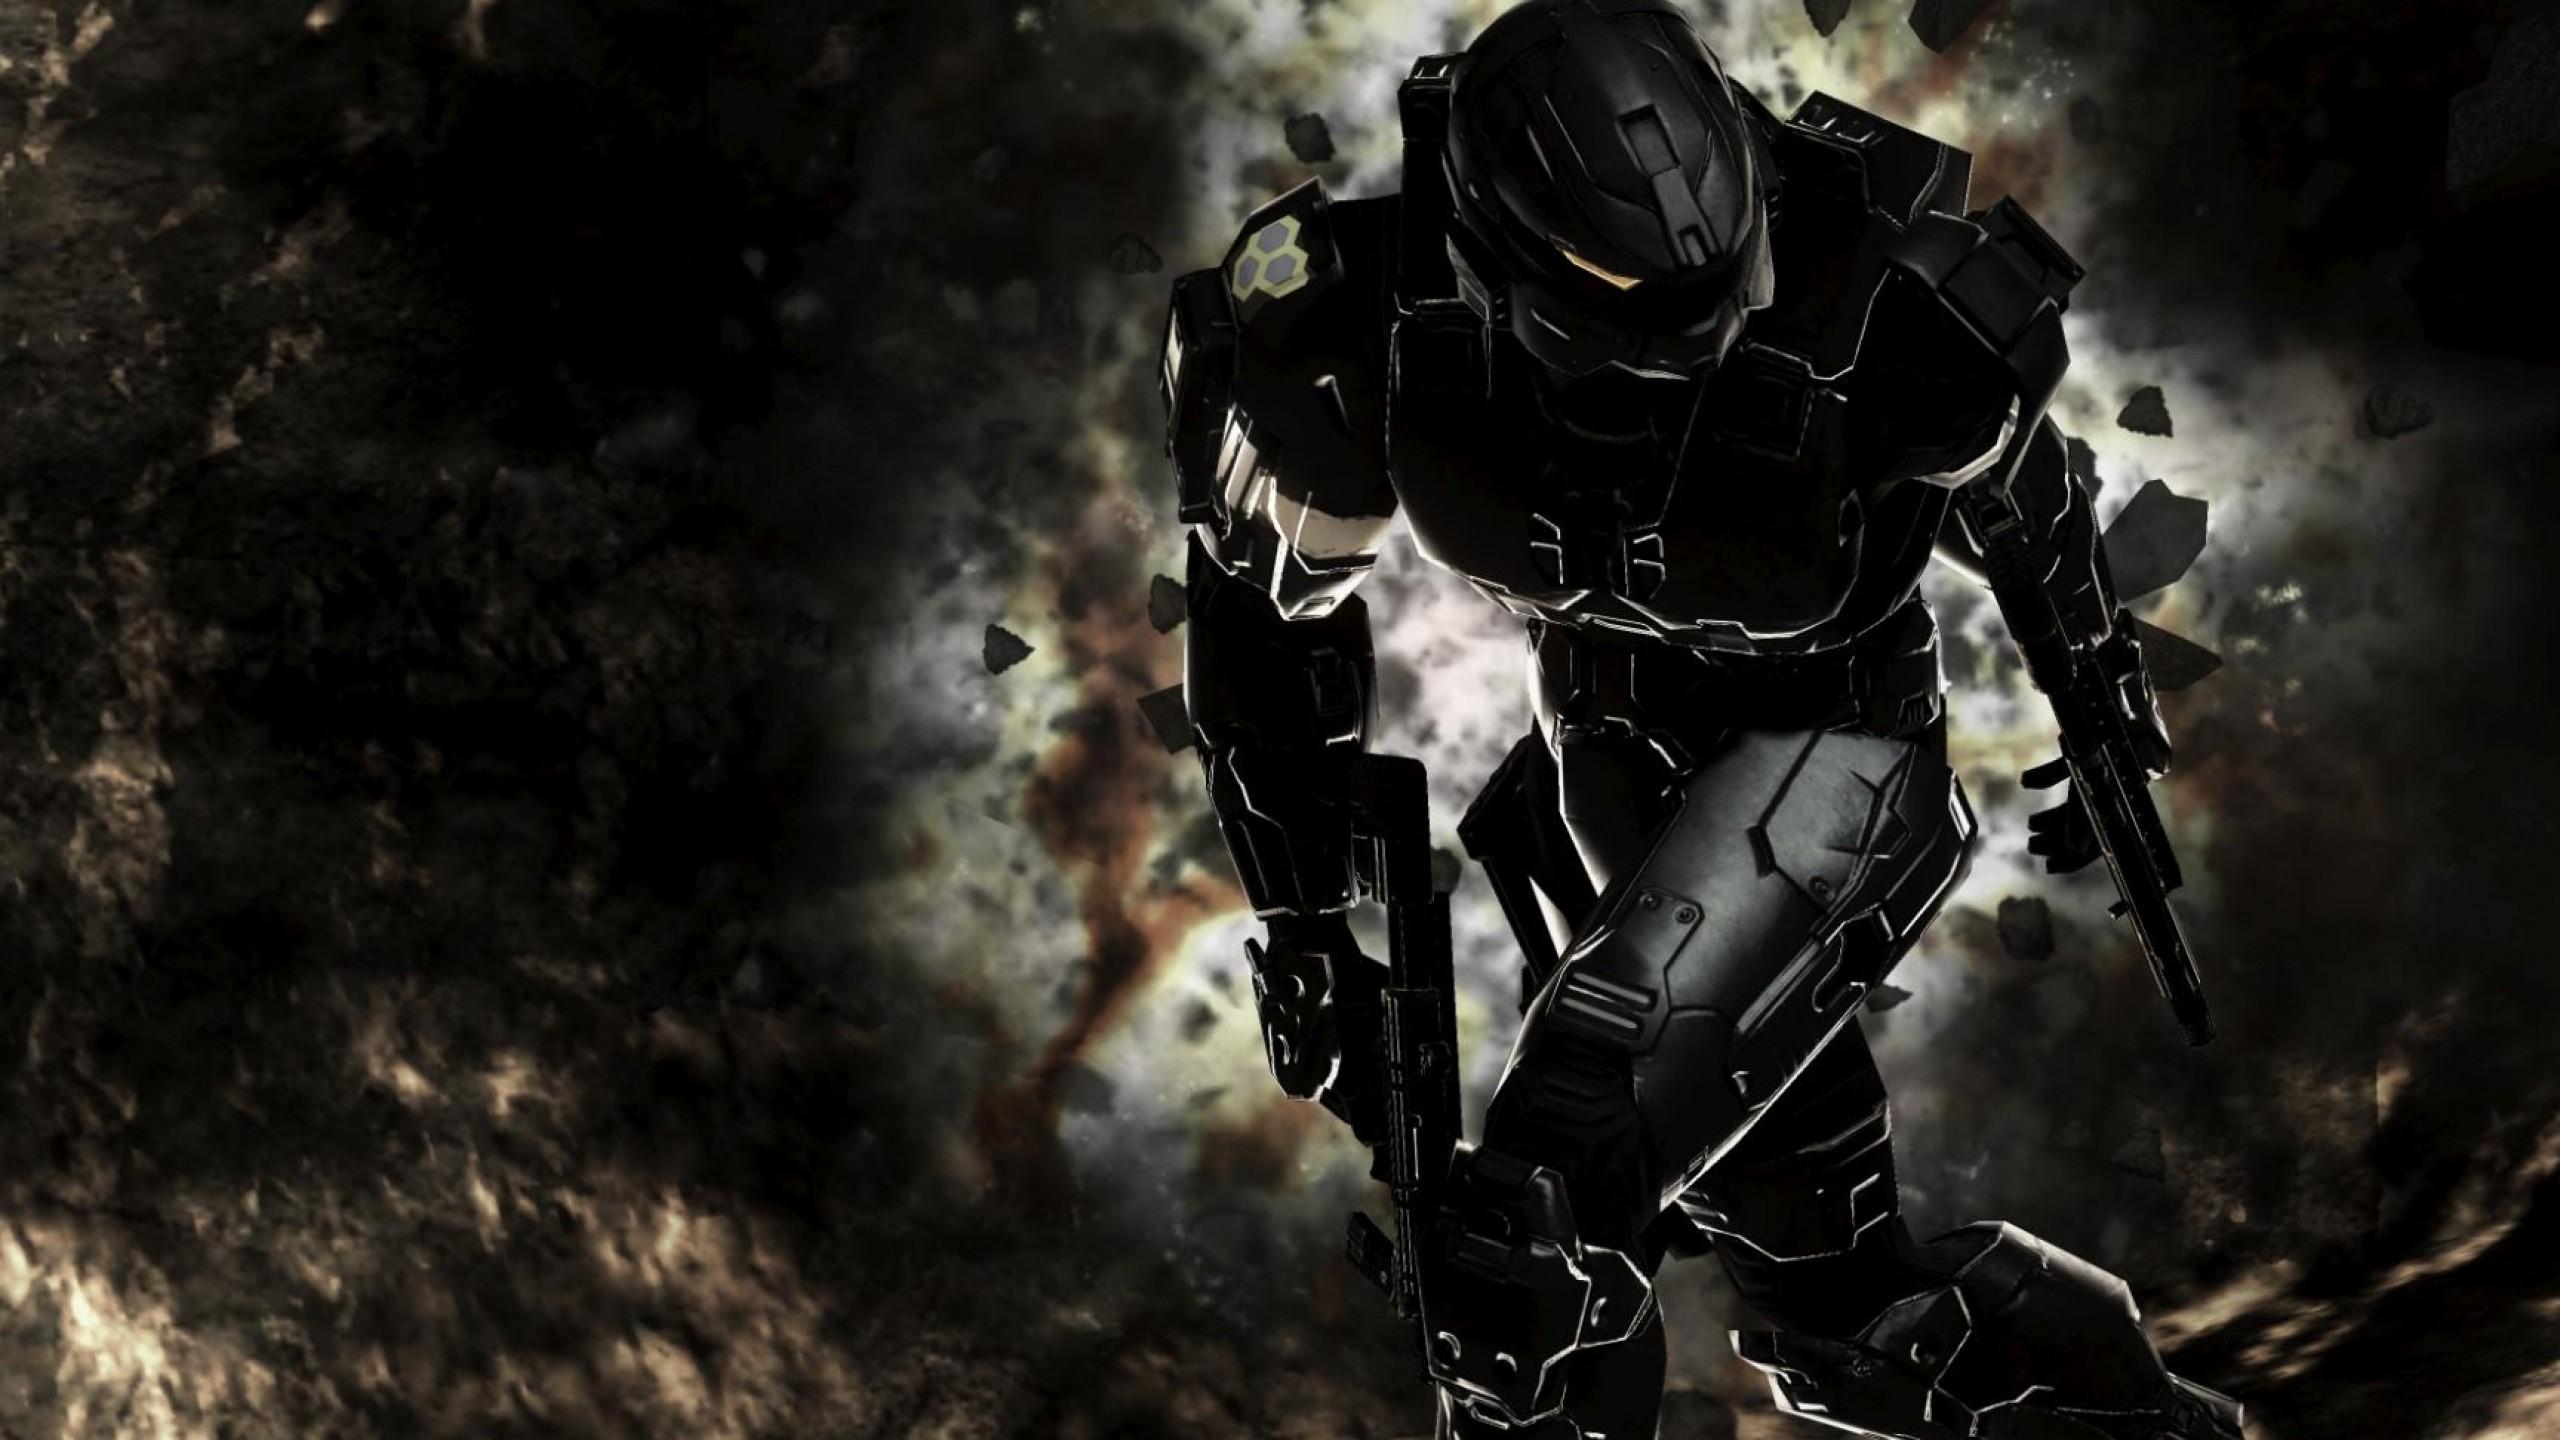 2560x1440 Halo Master Chief Spartan 1440p Resolution